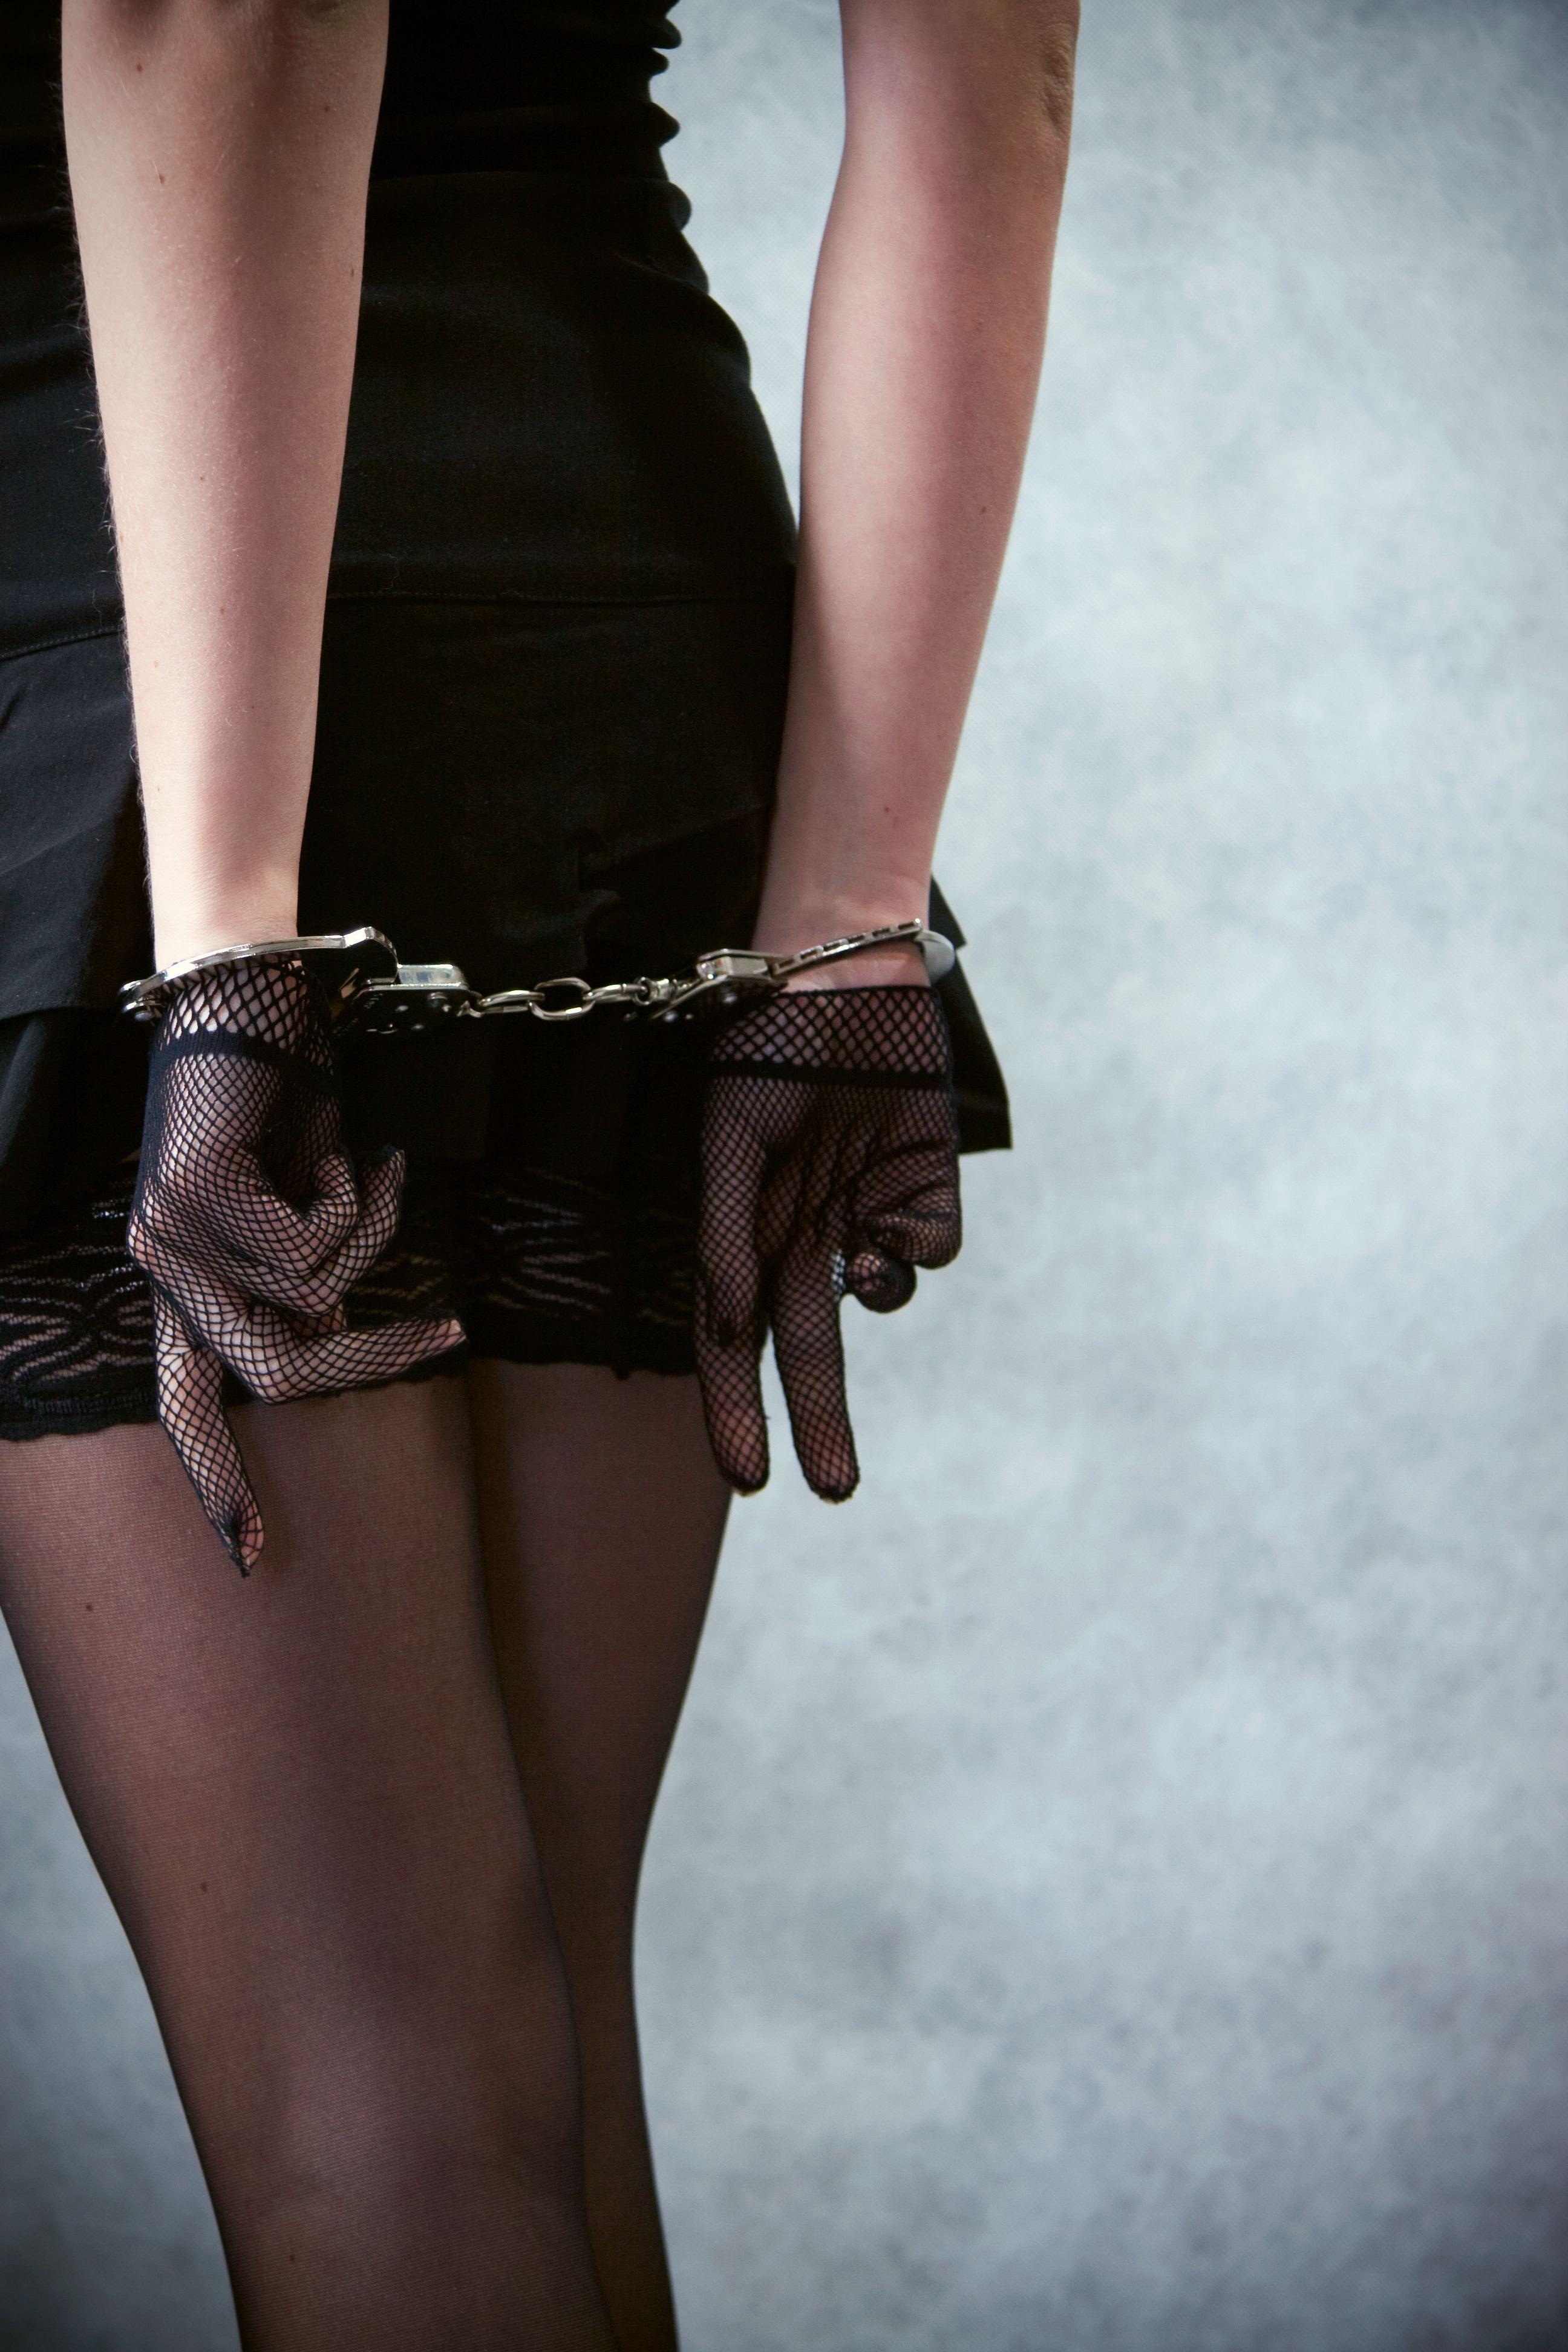 Sex tips nasty Free Sex